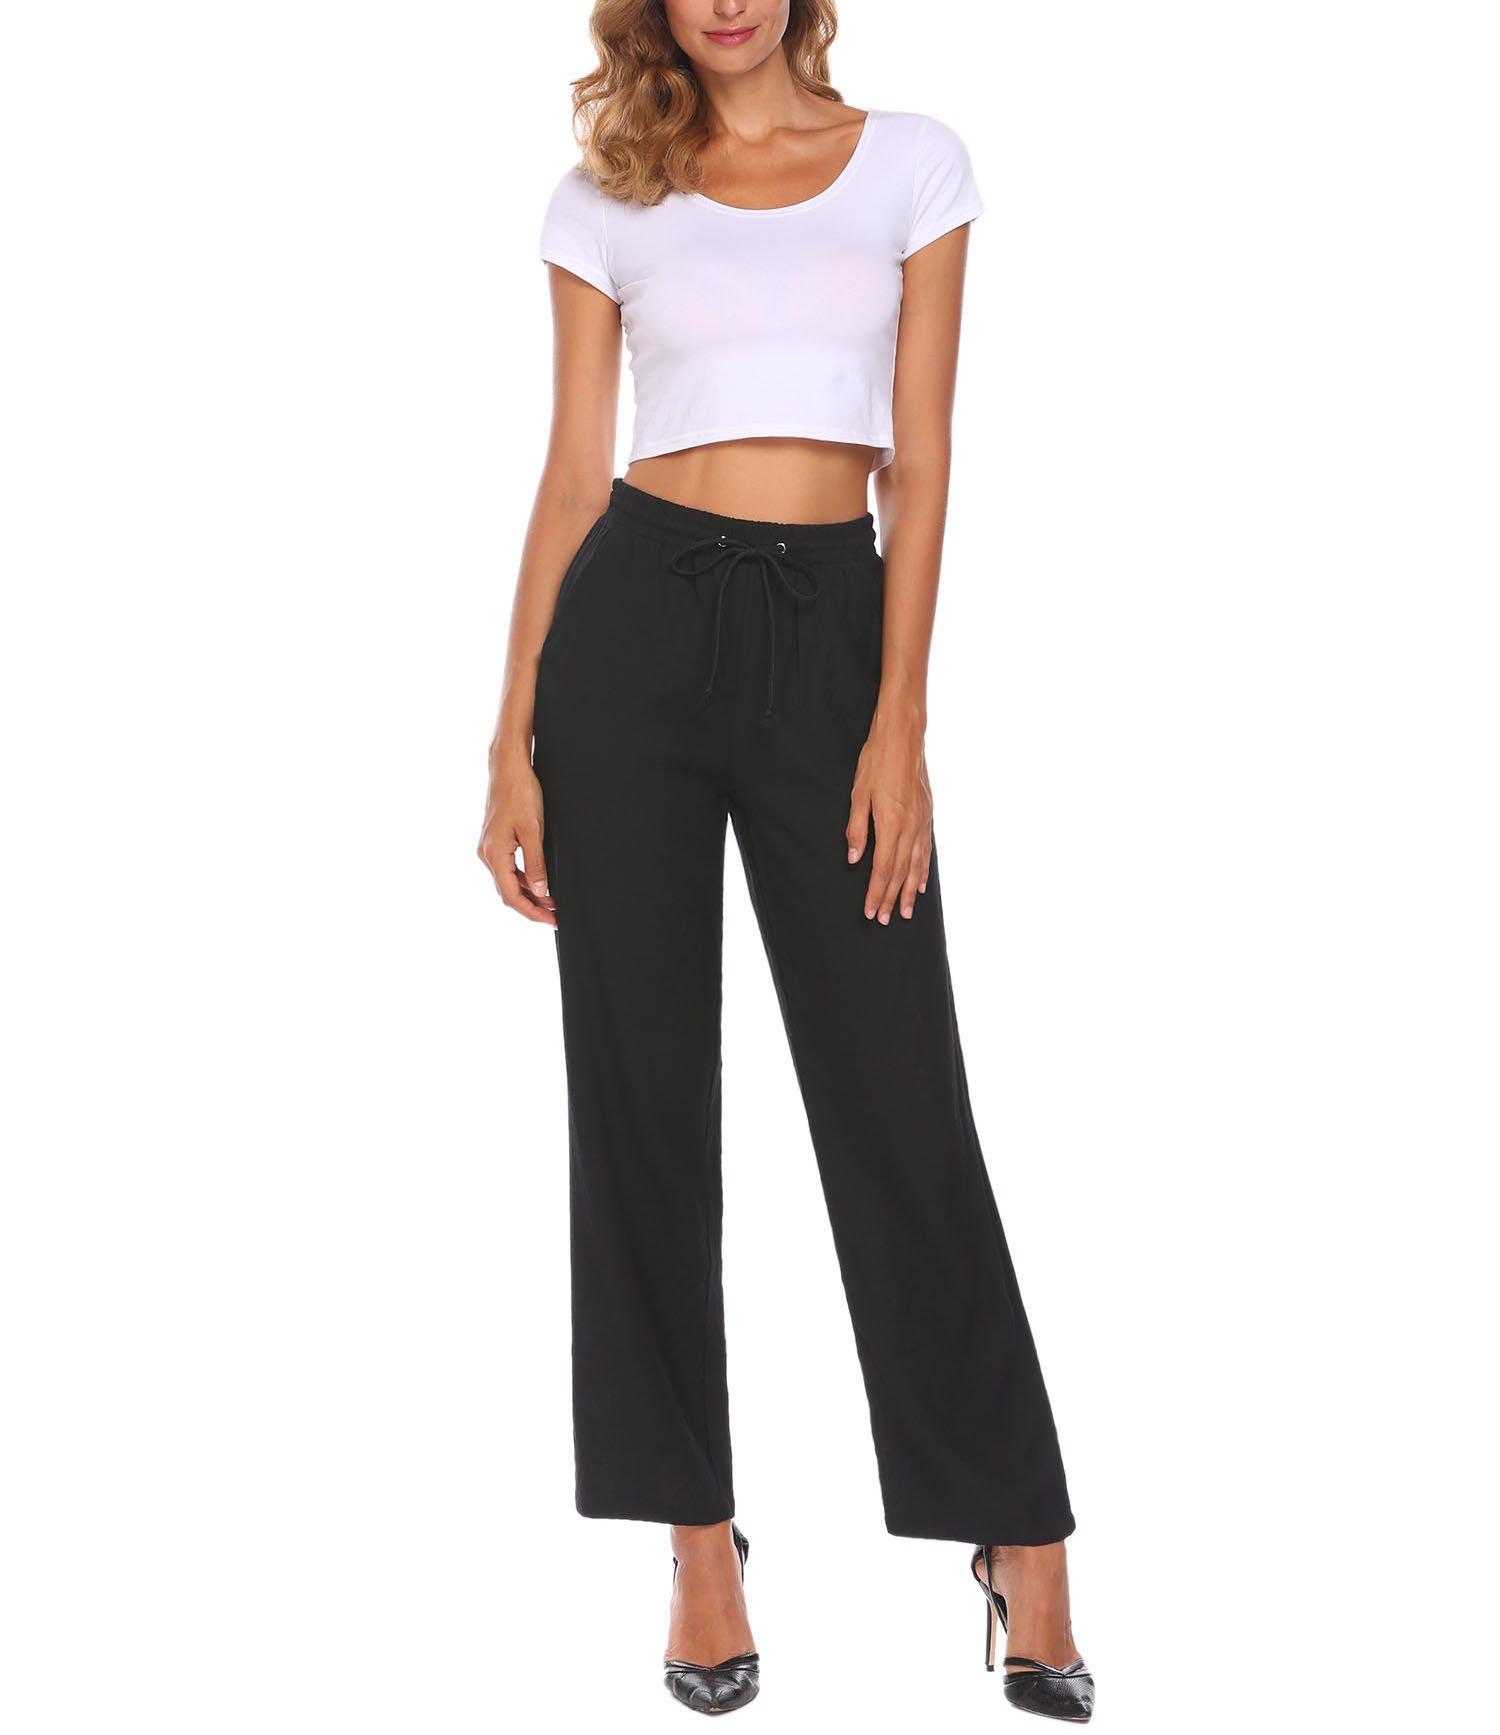 keliqq Women's Casual High Waist Stretchy Skinny Soft Pants